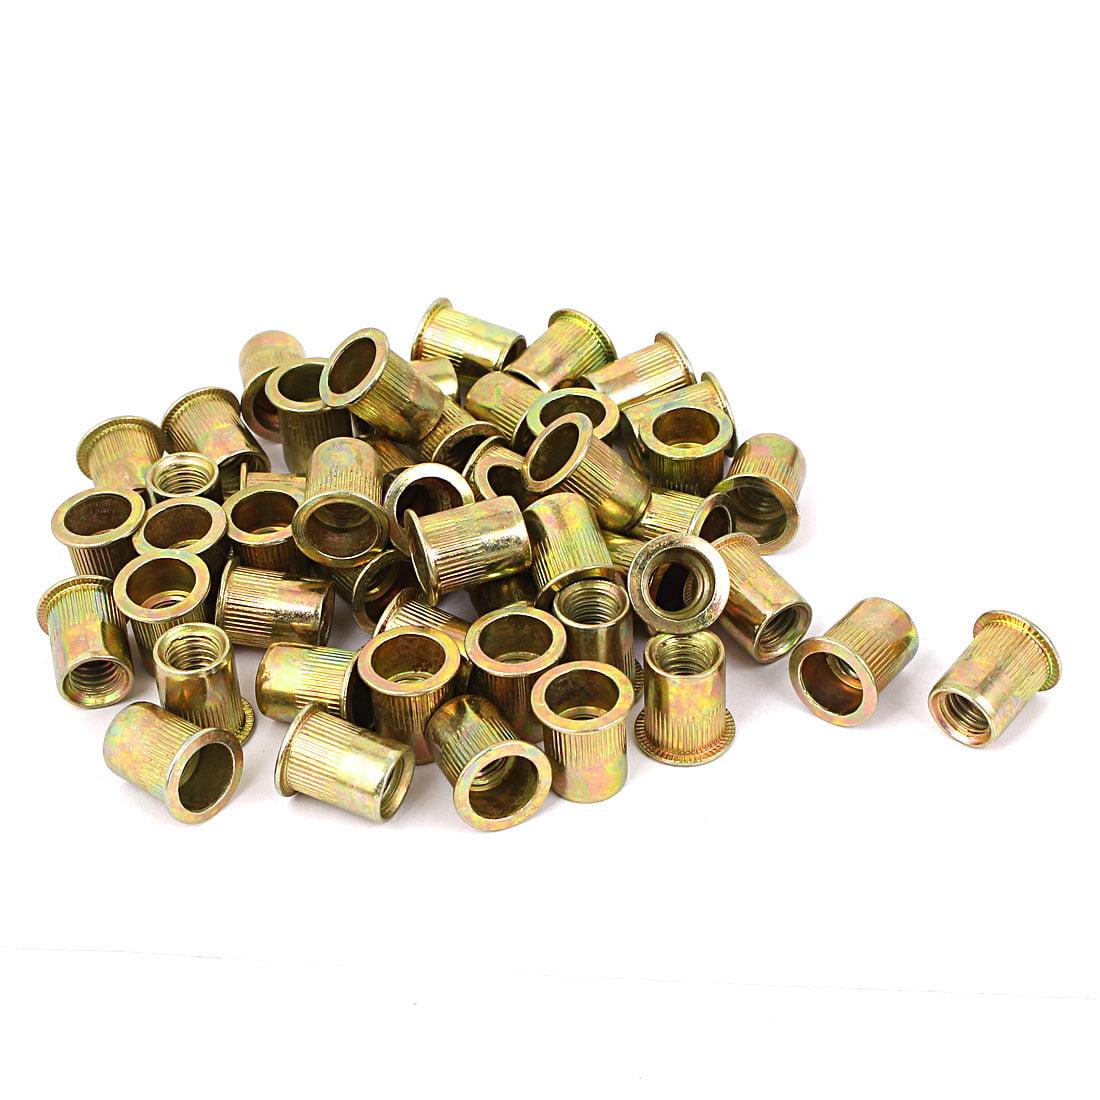 "Uxcell 3/8""-16 Metal Flat Head Rivet Nut Insert Nutsert Gold Tone (50-pack)"